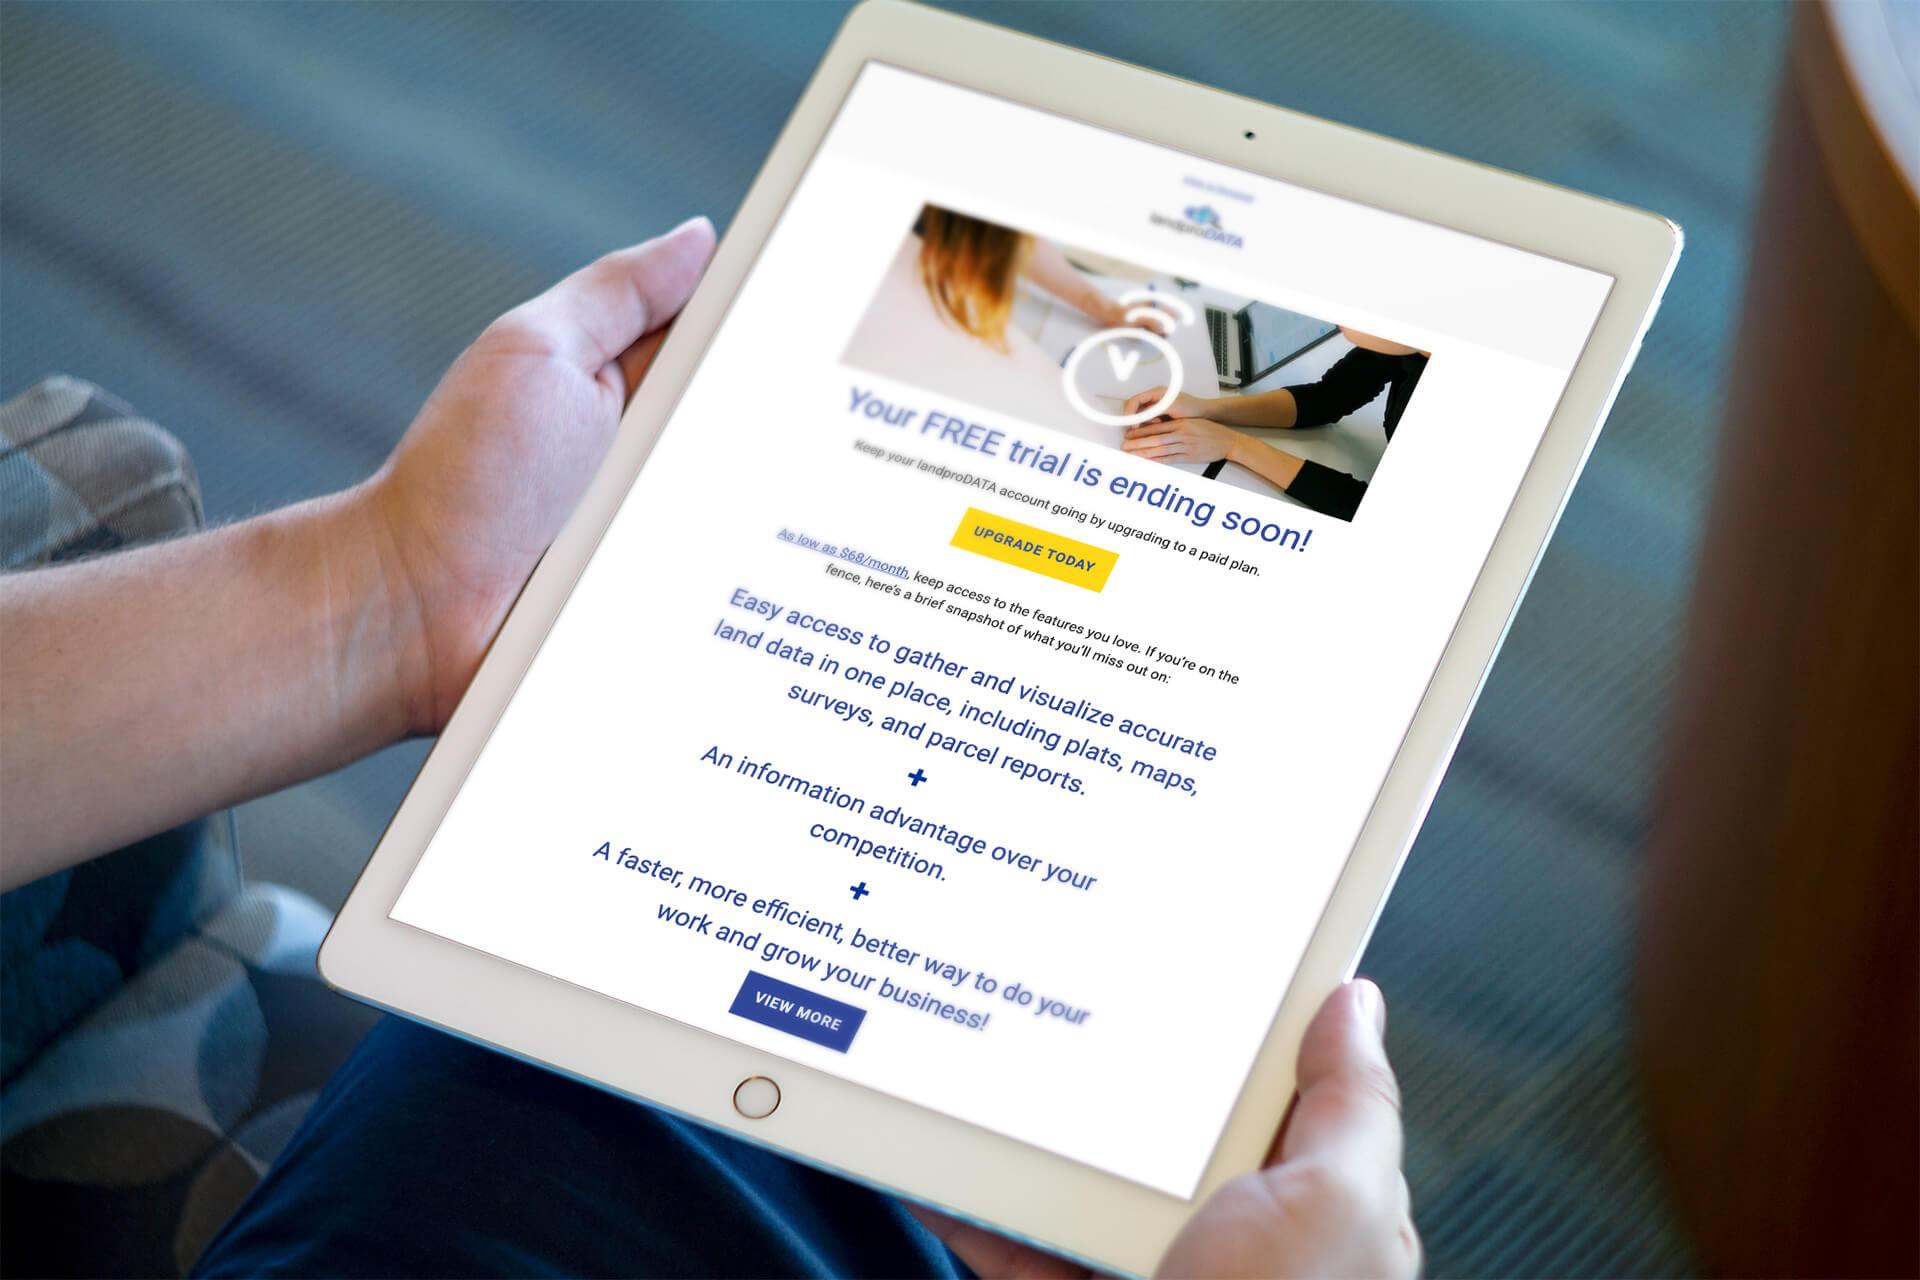 Email Marketing Mockups for landproDATA